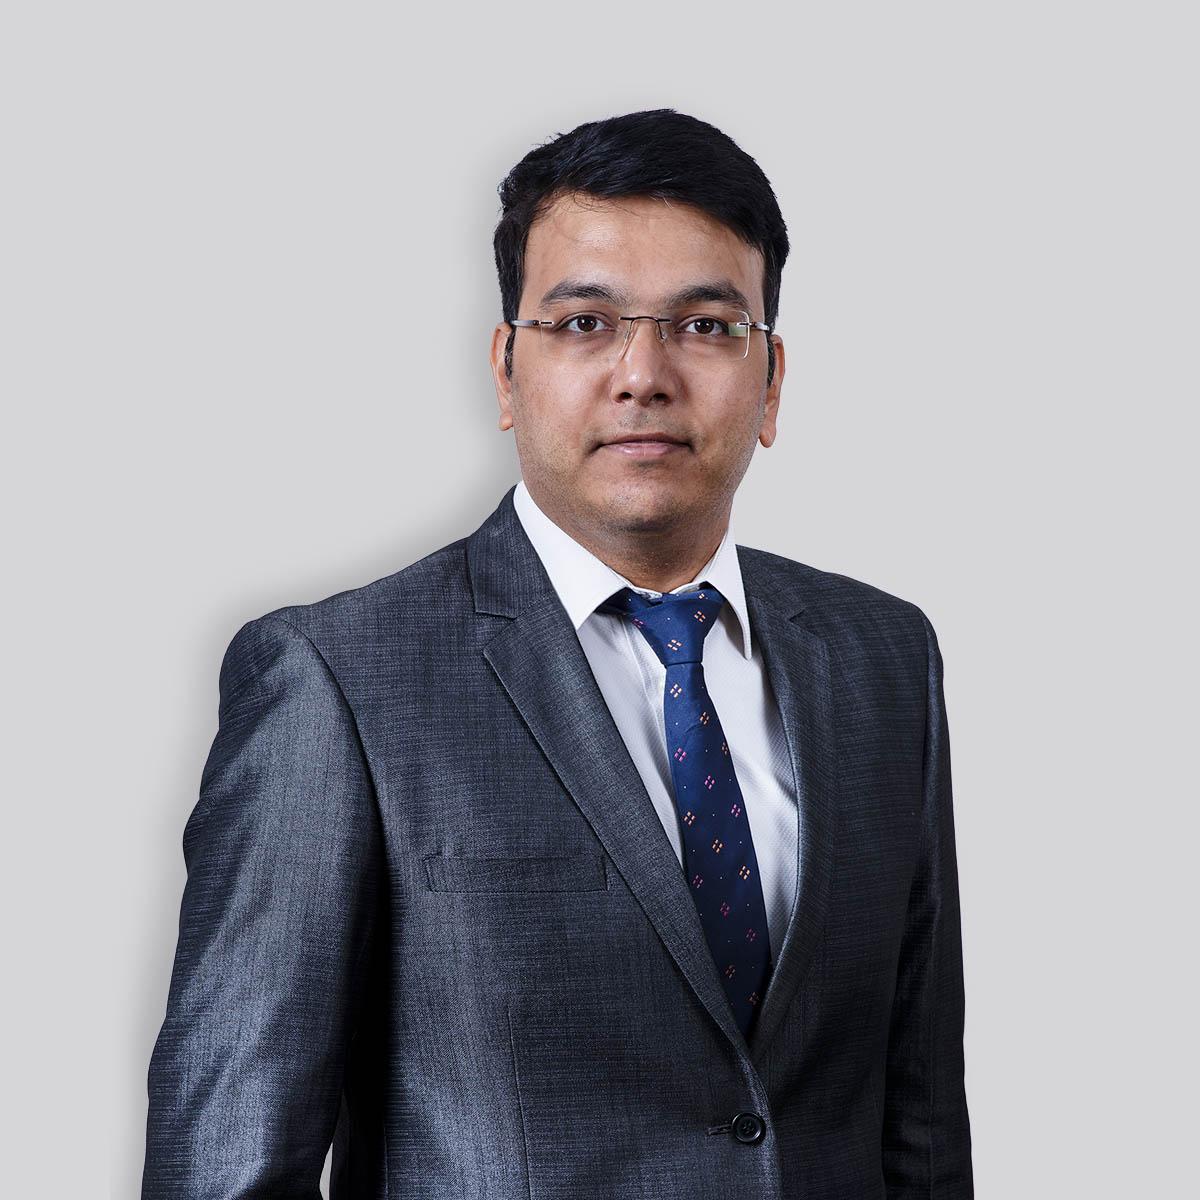 Abhinav Sethi